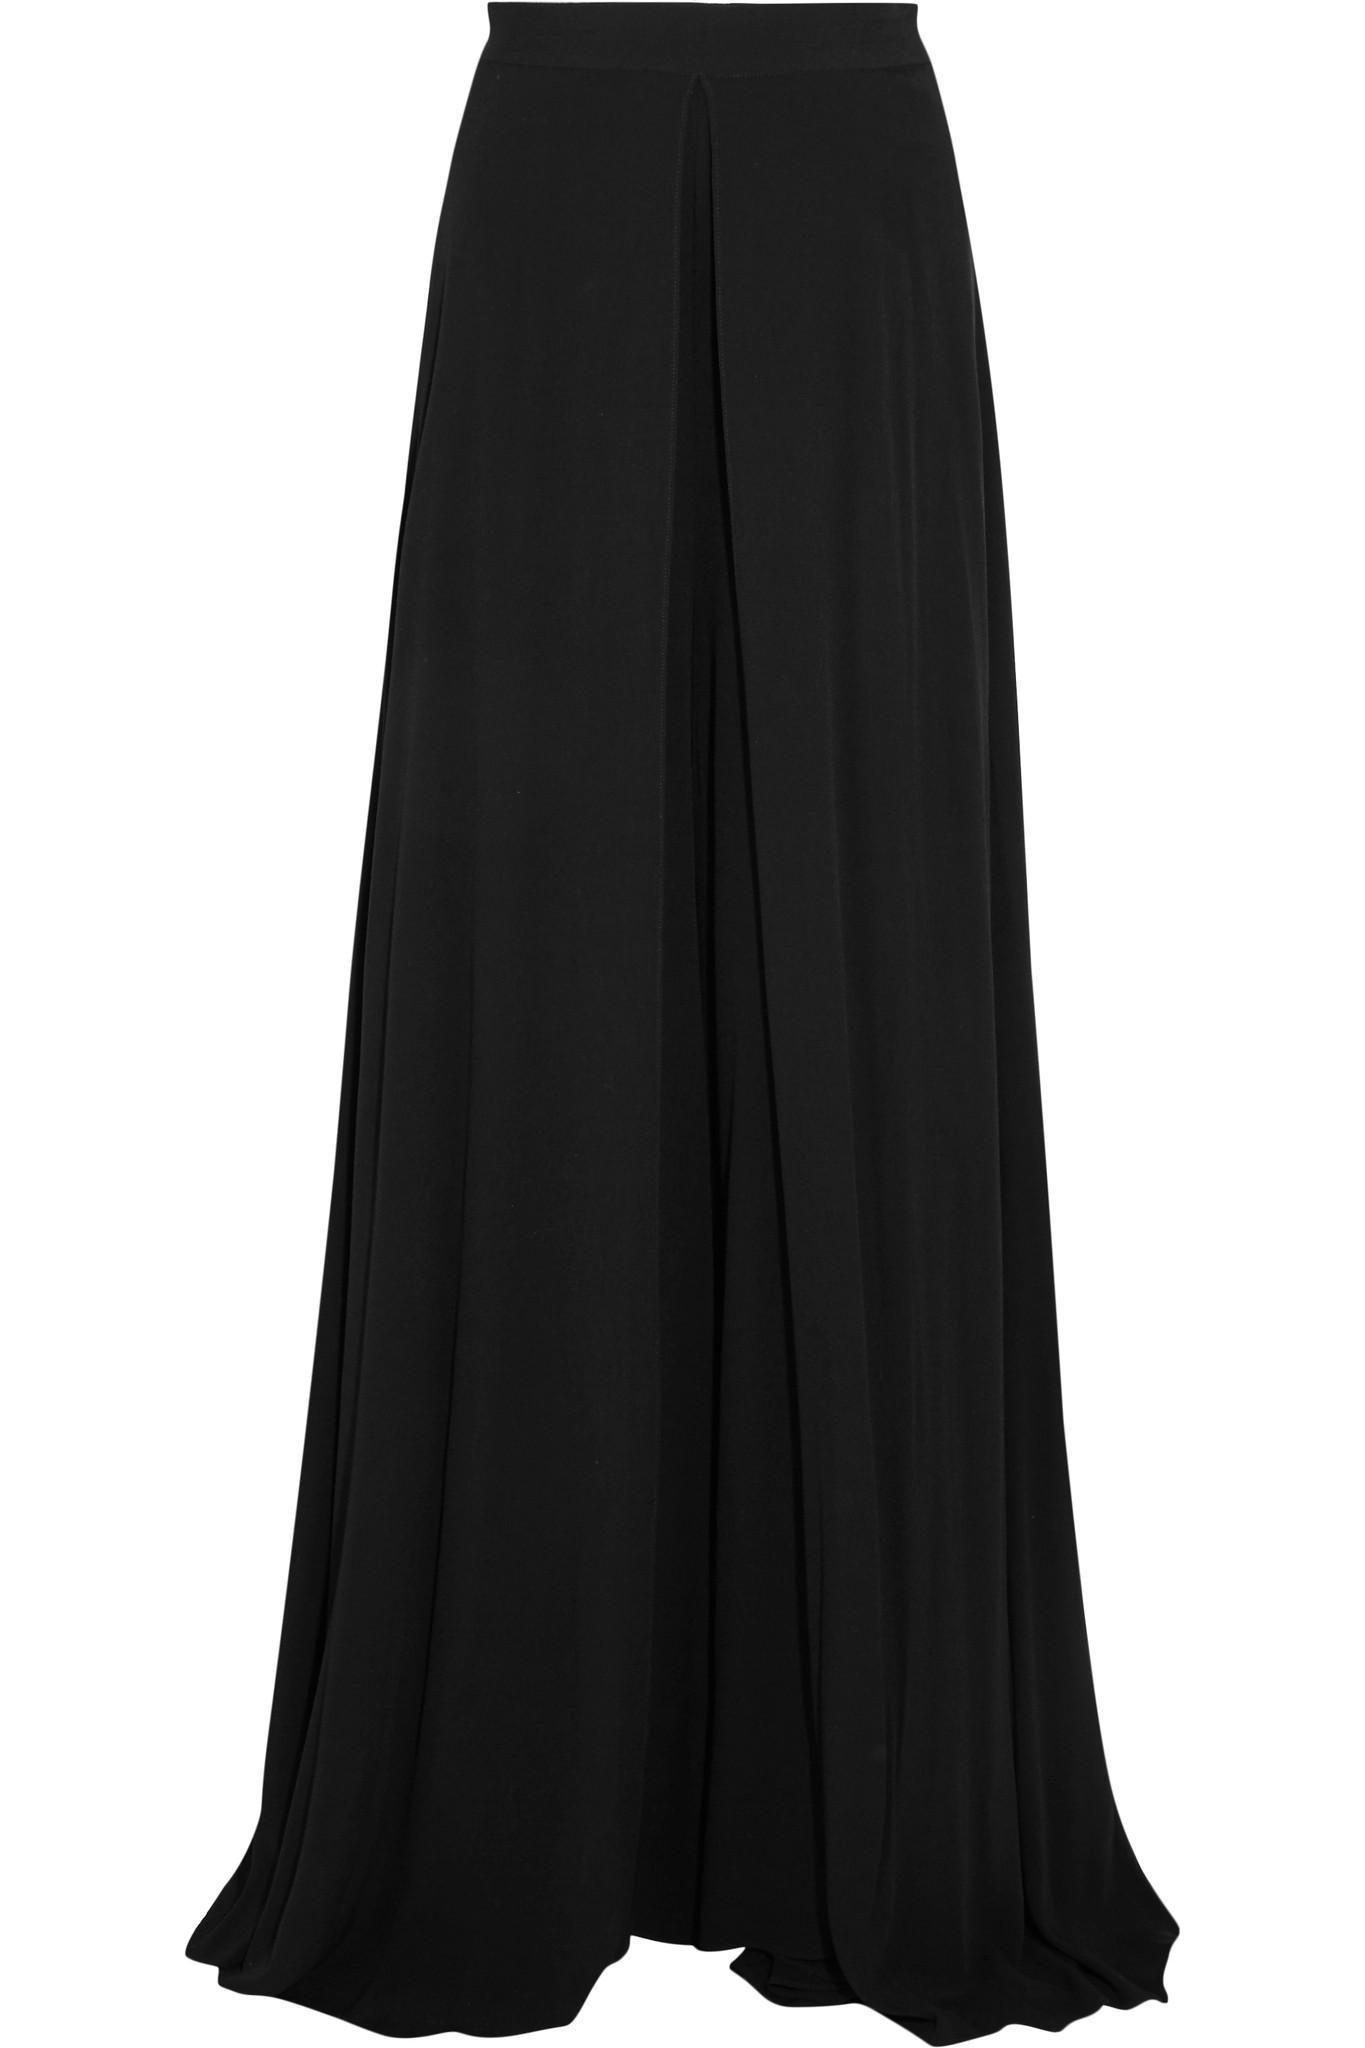 Crêpe Pantalon Large Jambe - Getty Noir Rosetta nYCjHH4